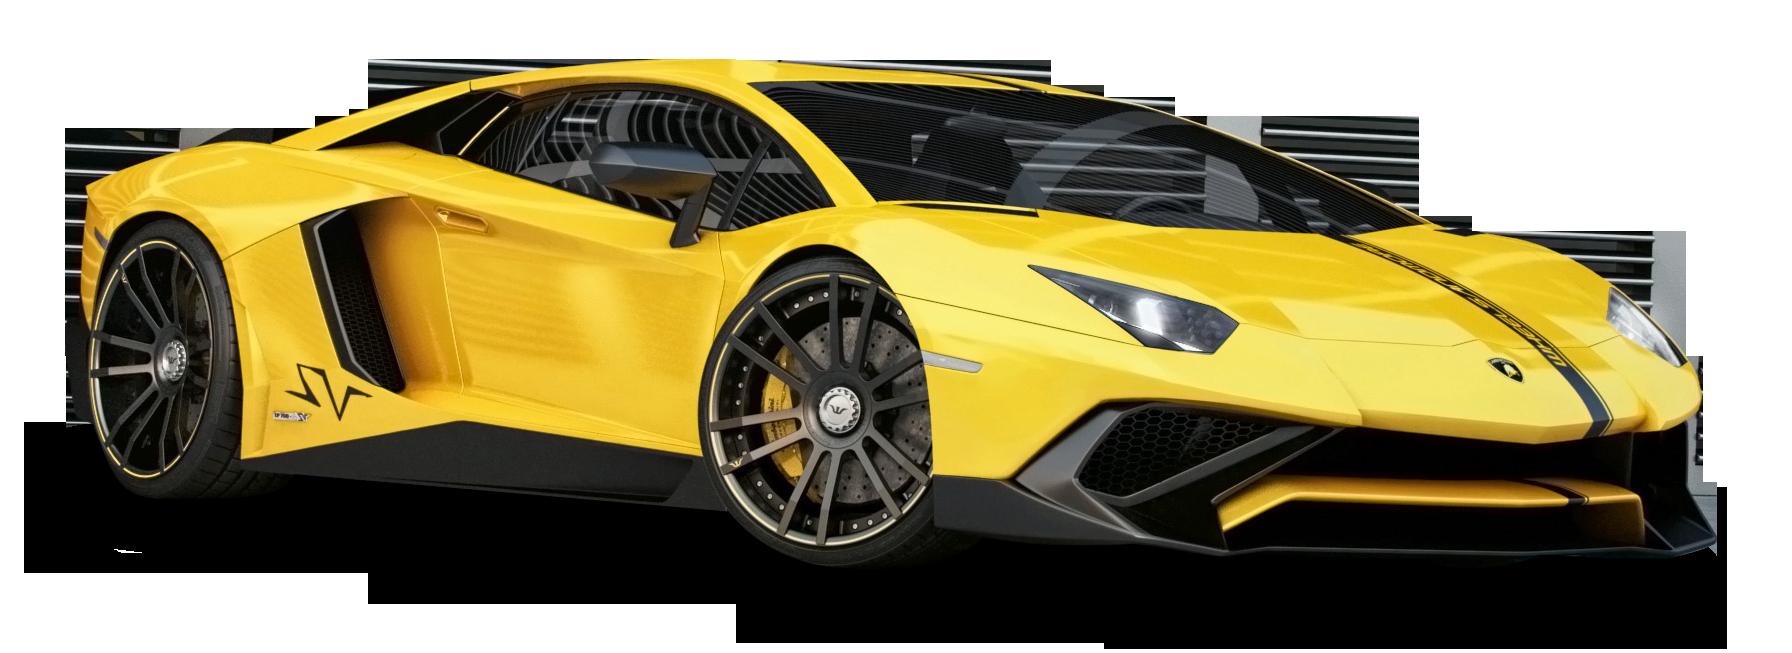 Lamborghini Aventador Yellow Car PNG Image.